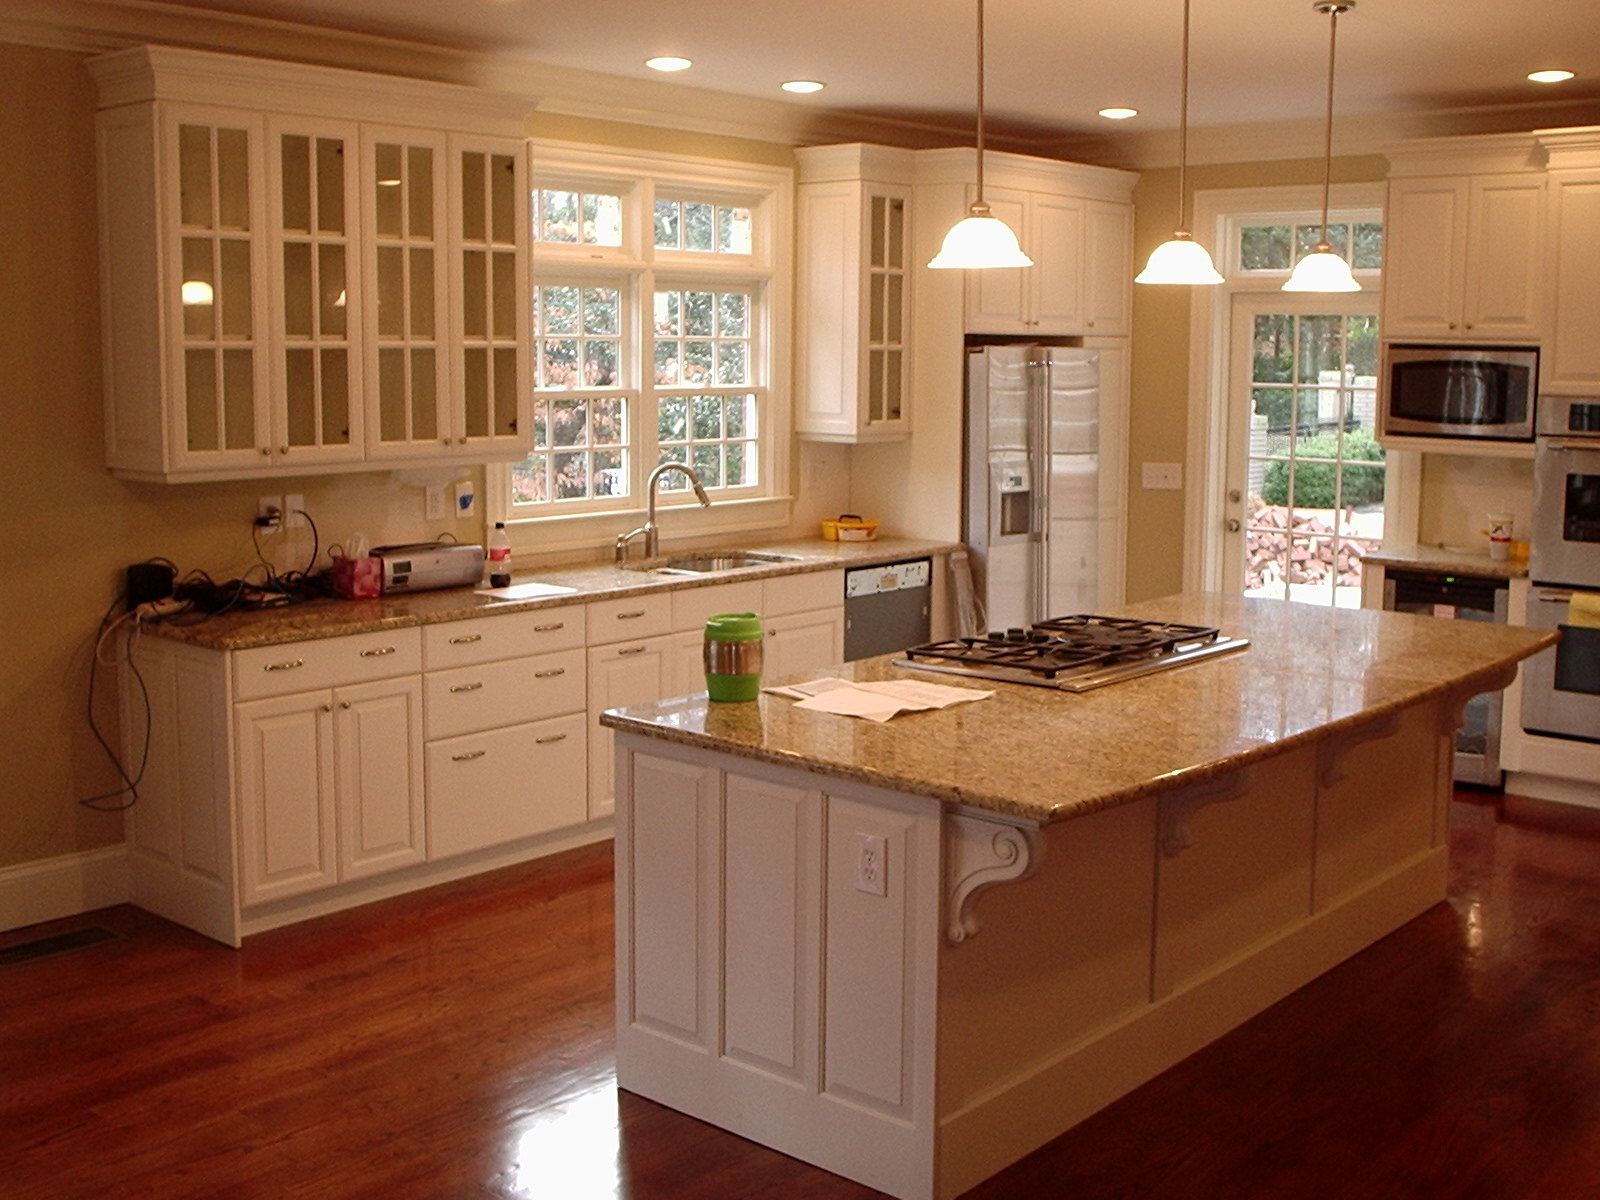 Green kitchen appliances Photo - 1